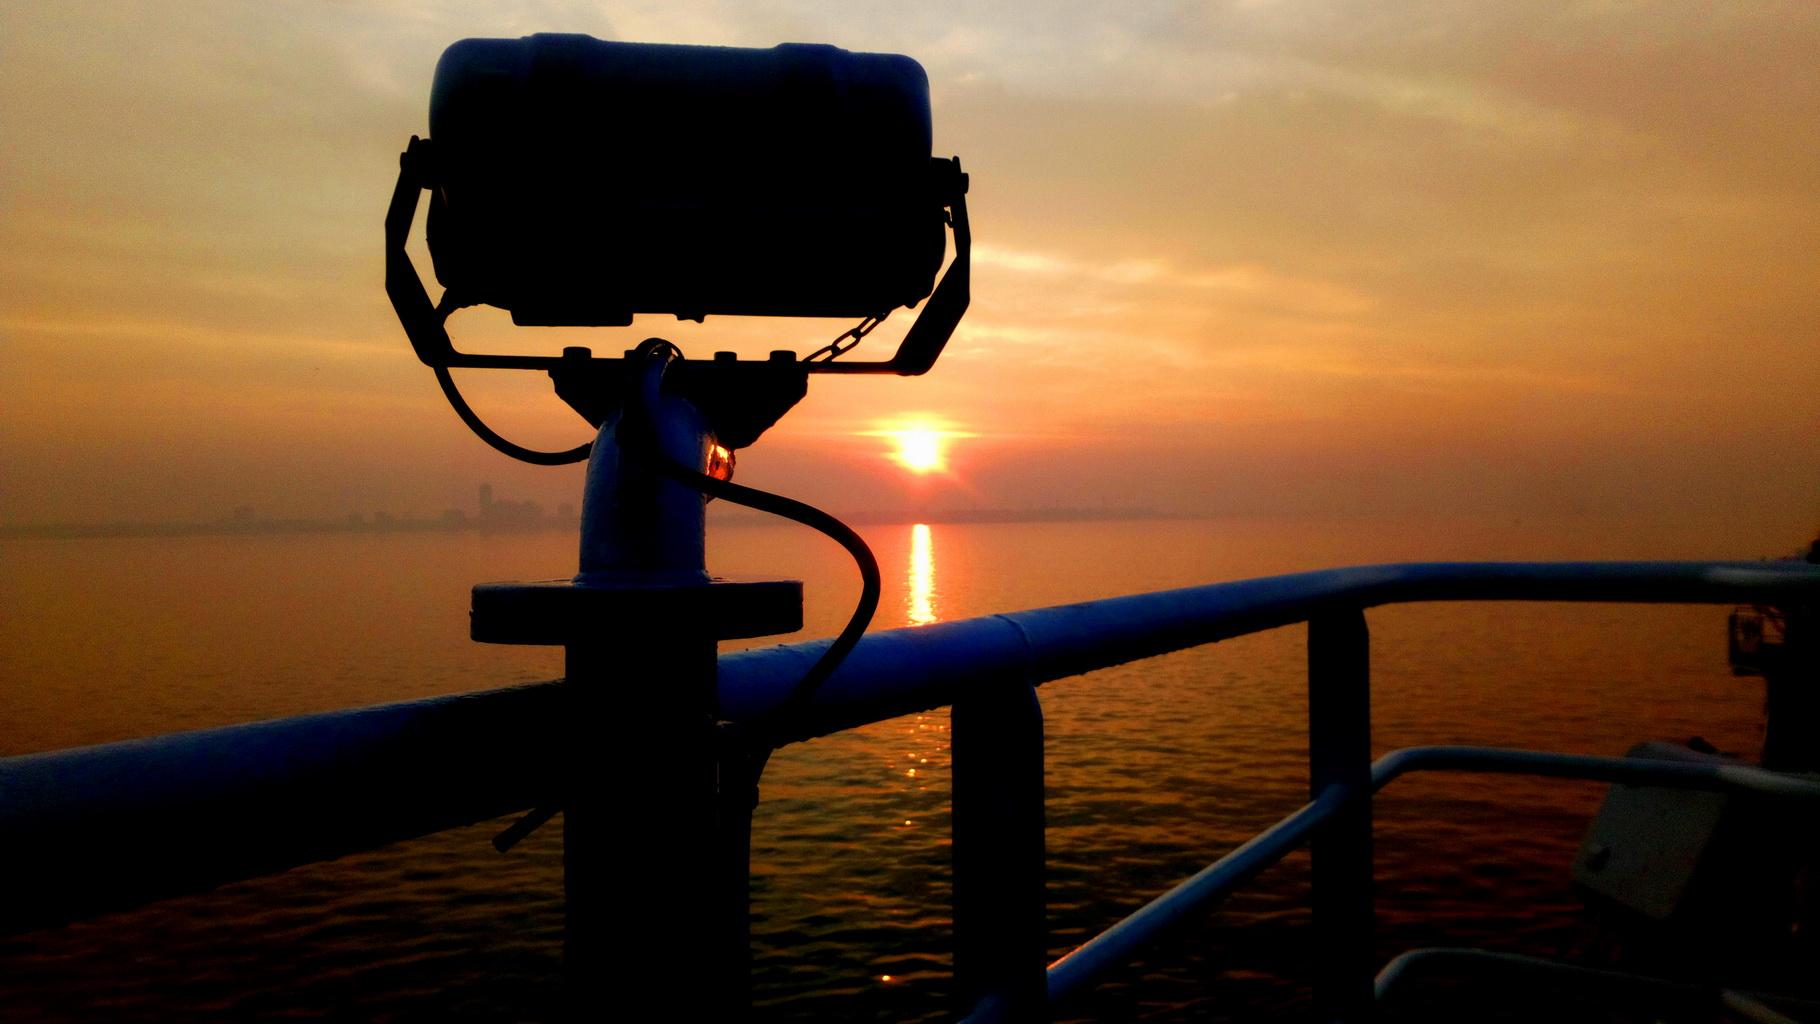 Dawn02.jpg